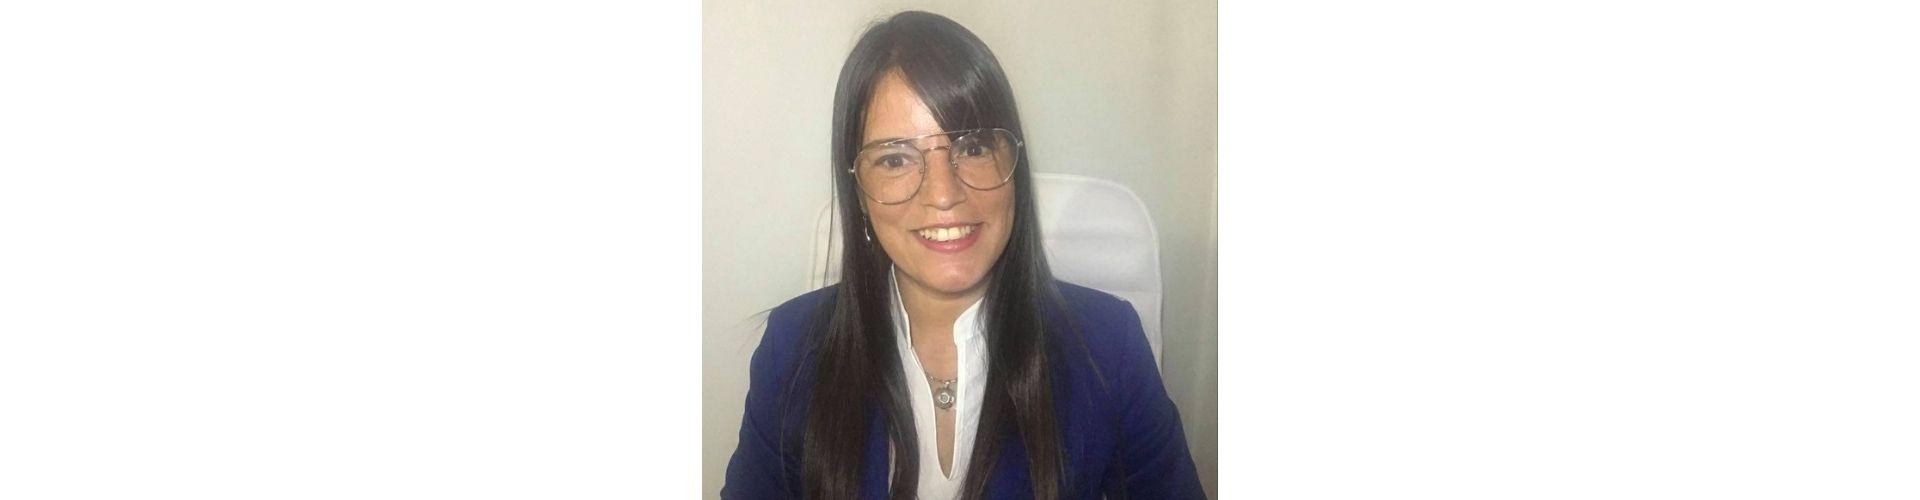 Fedra Gonzalez